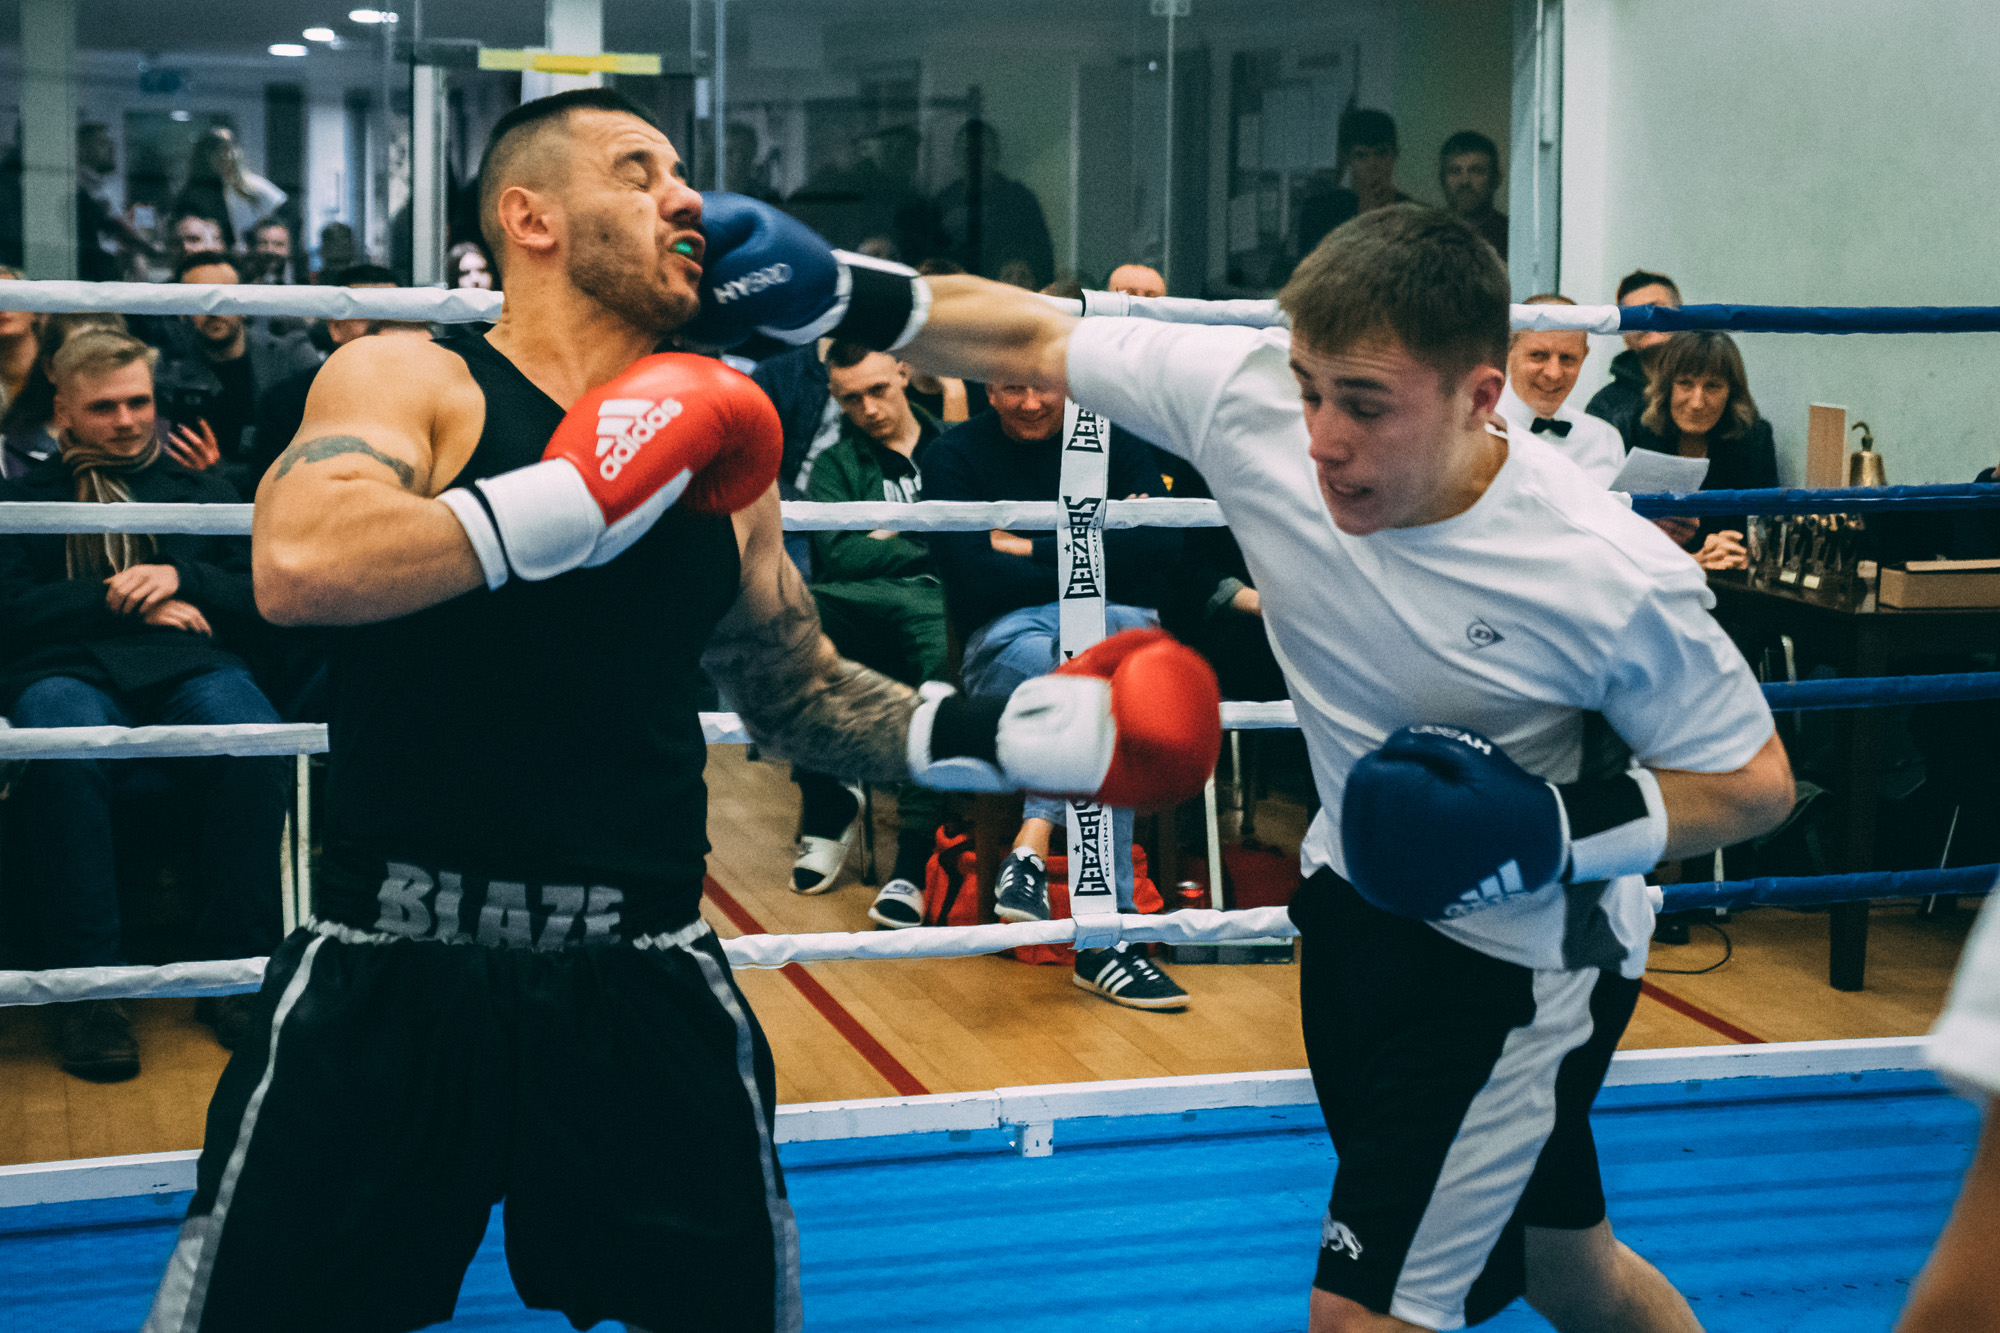 Market Drayton Boxing